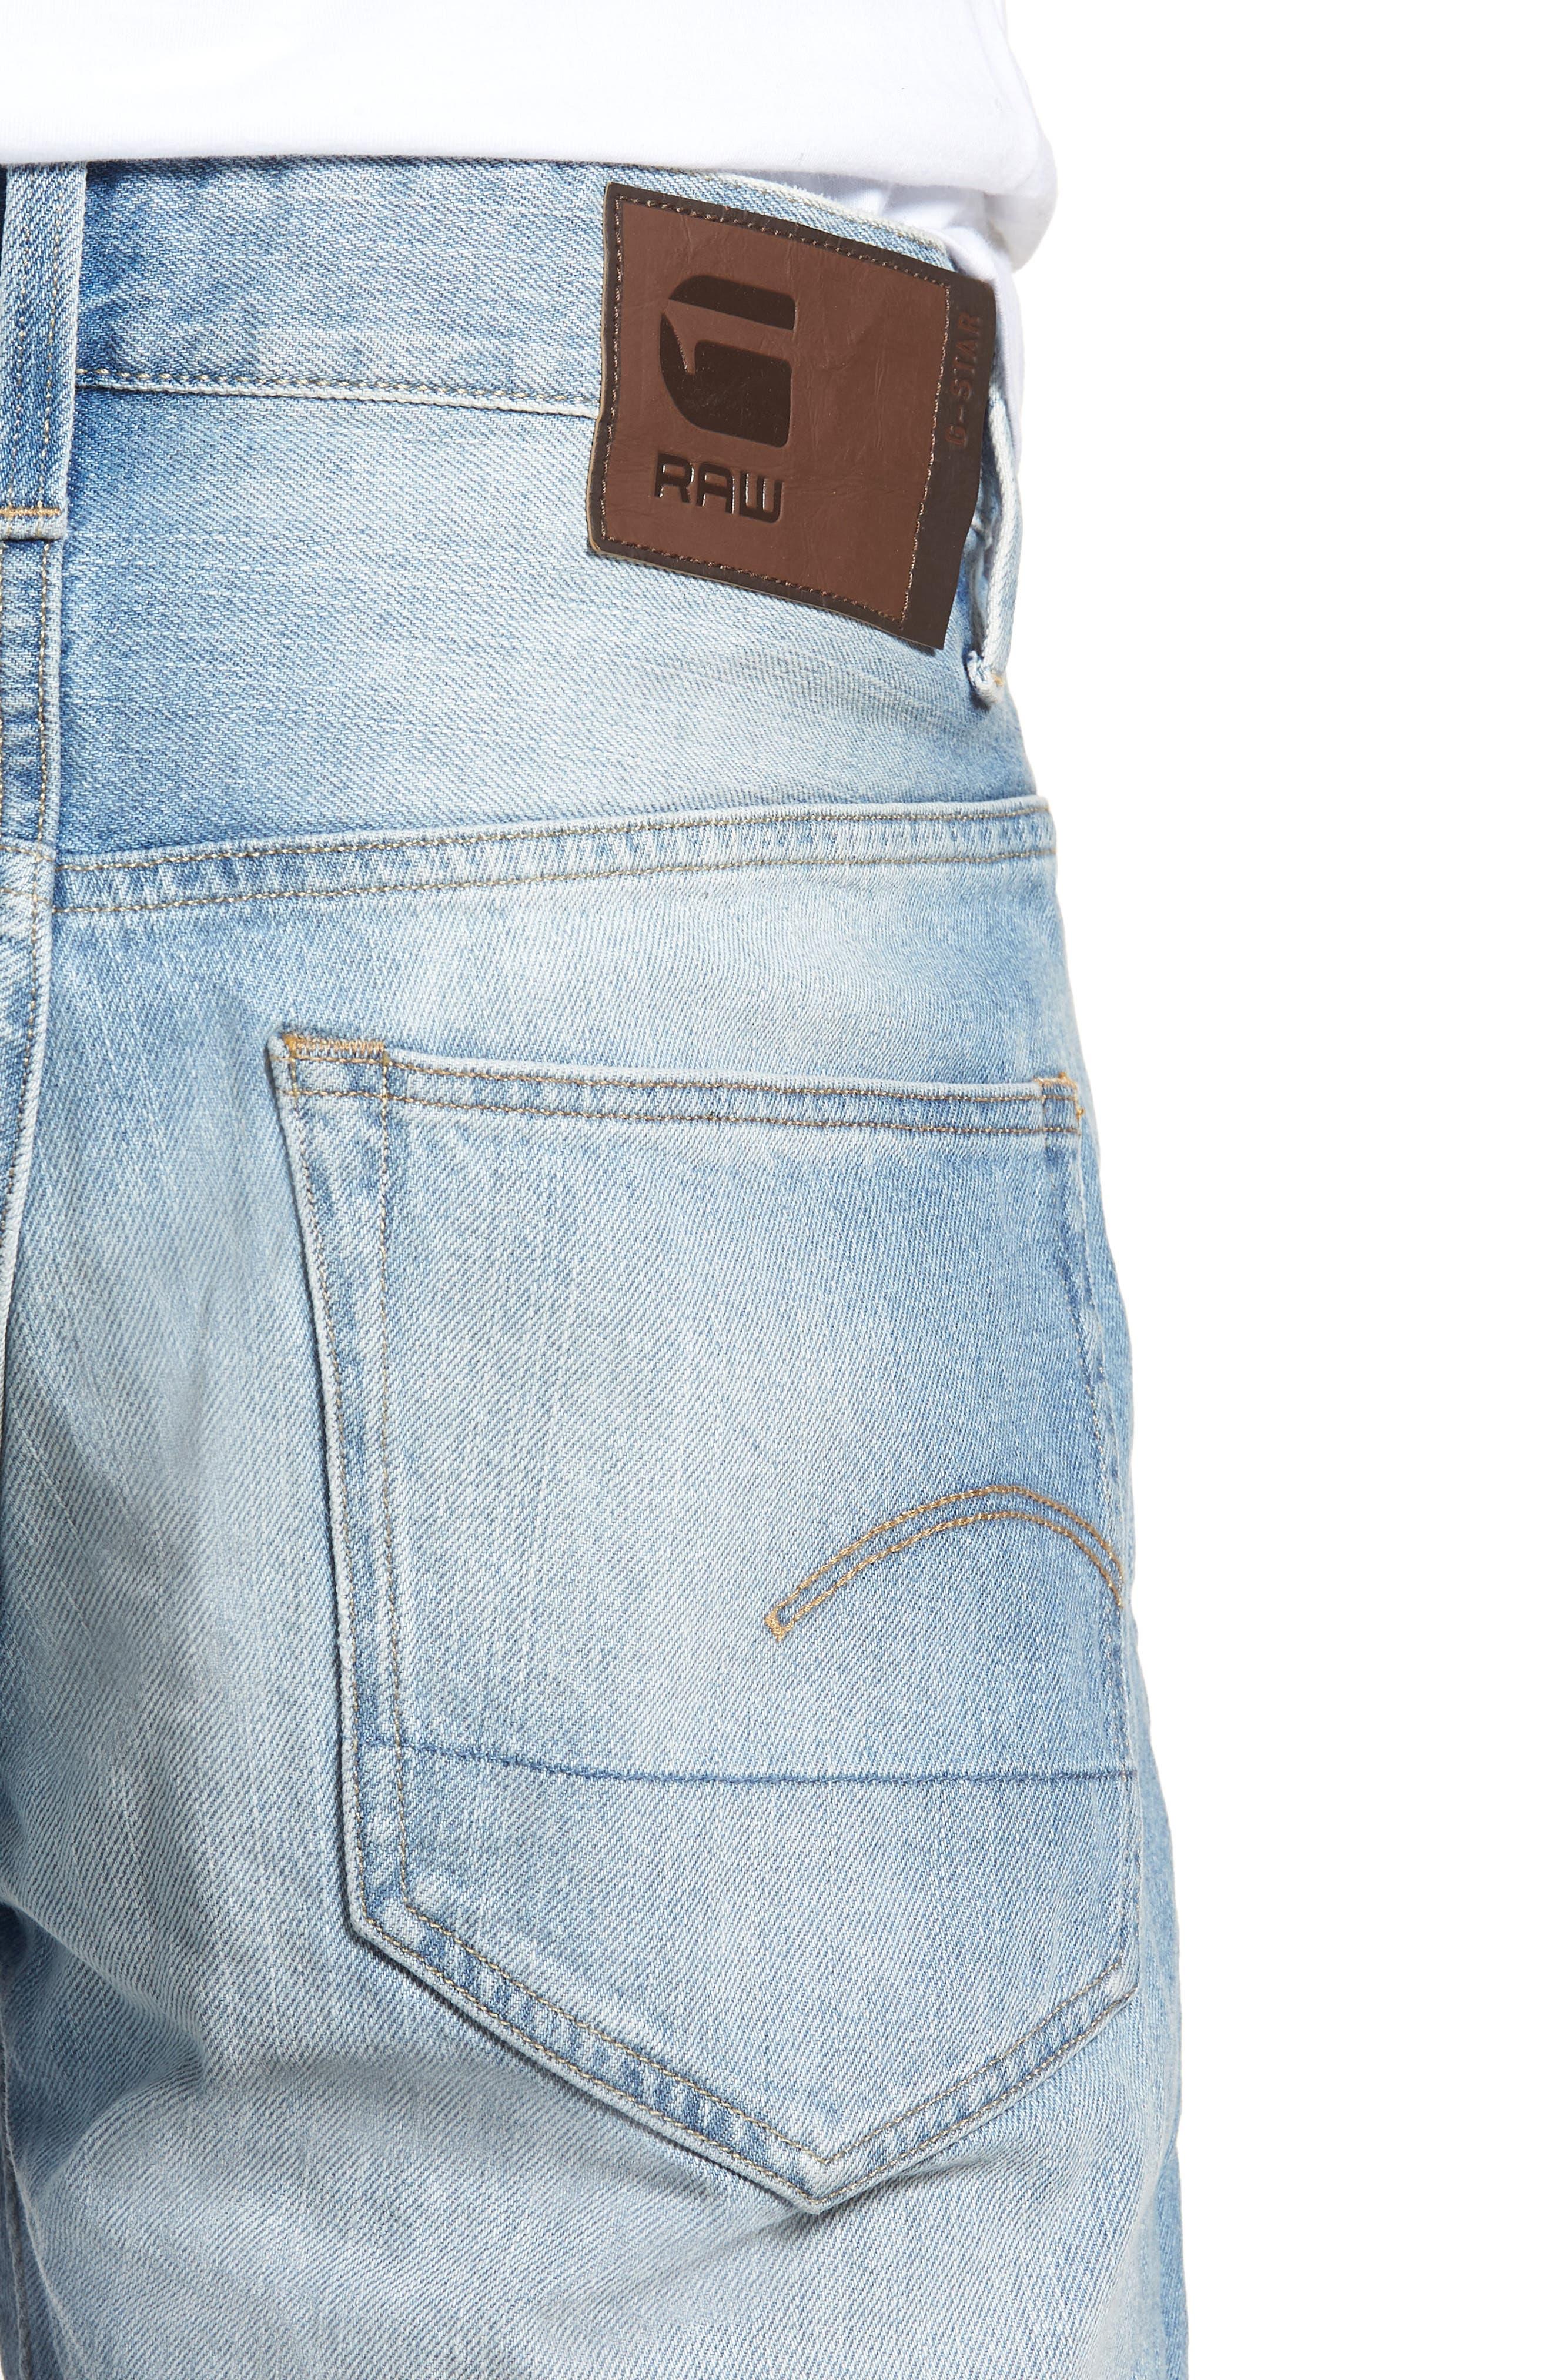 Slim Fit Denim Shorts,                             Alternate thumbnail 3, color,                             Light Aged